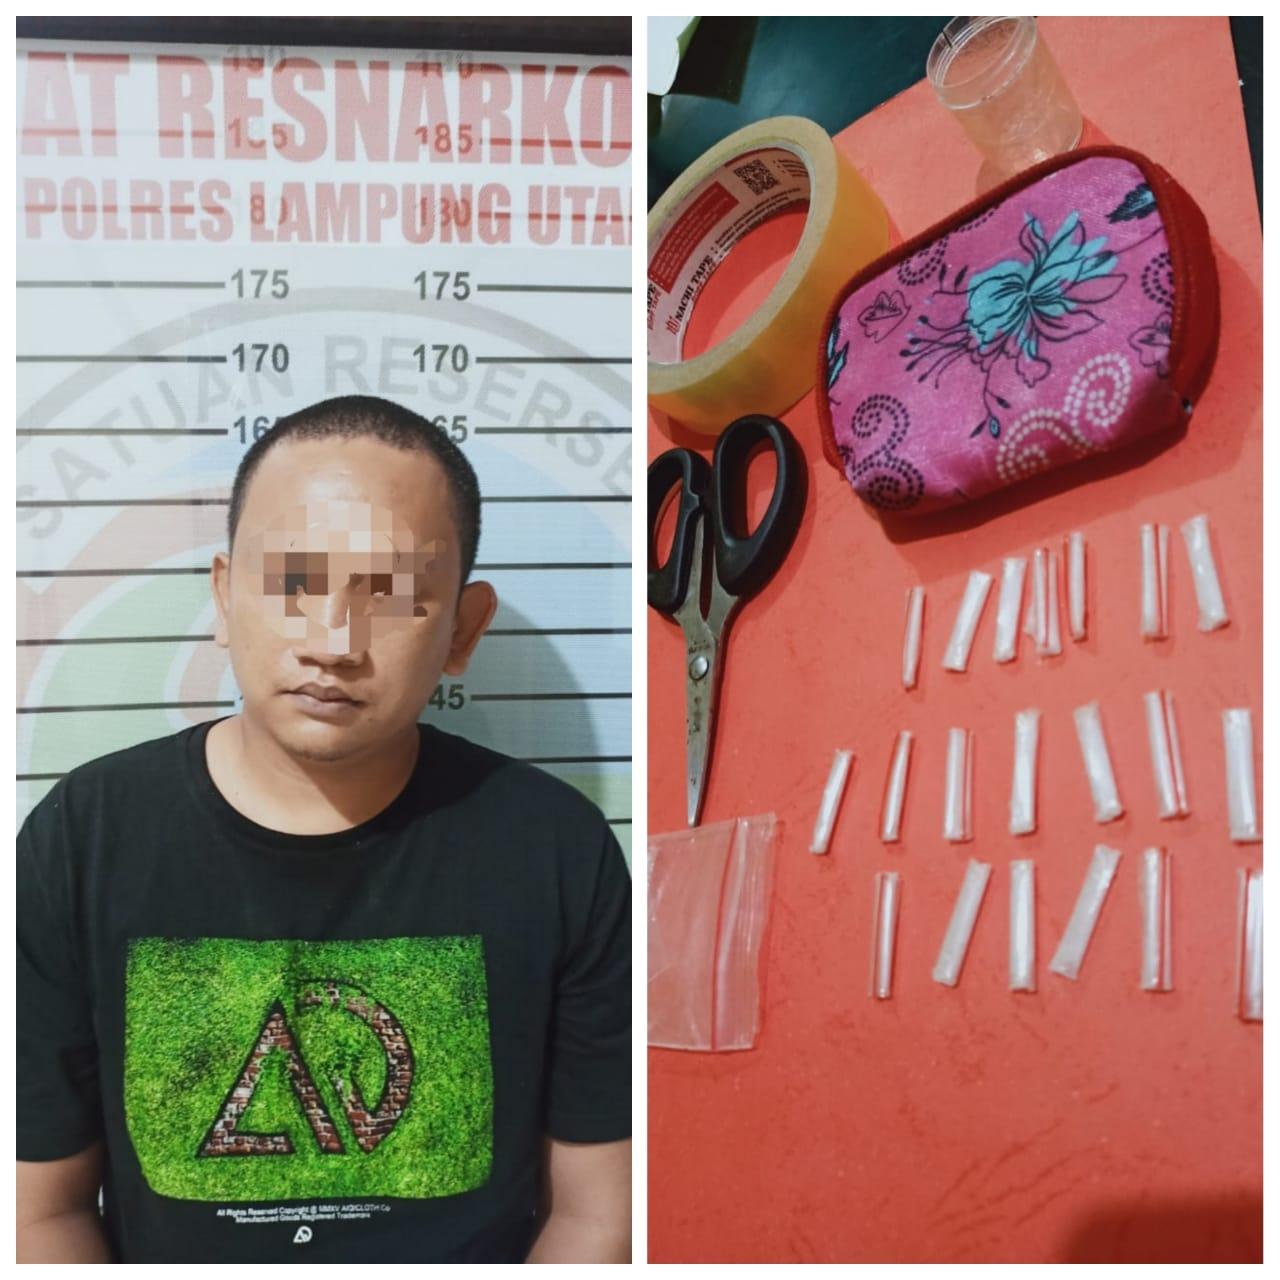 Satreserse Narkoba Polres Lampung Utara Temukan Barang haram Sebanyak 20 Paket Milik RA